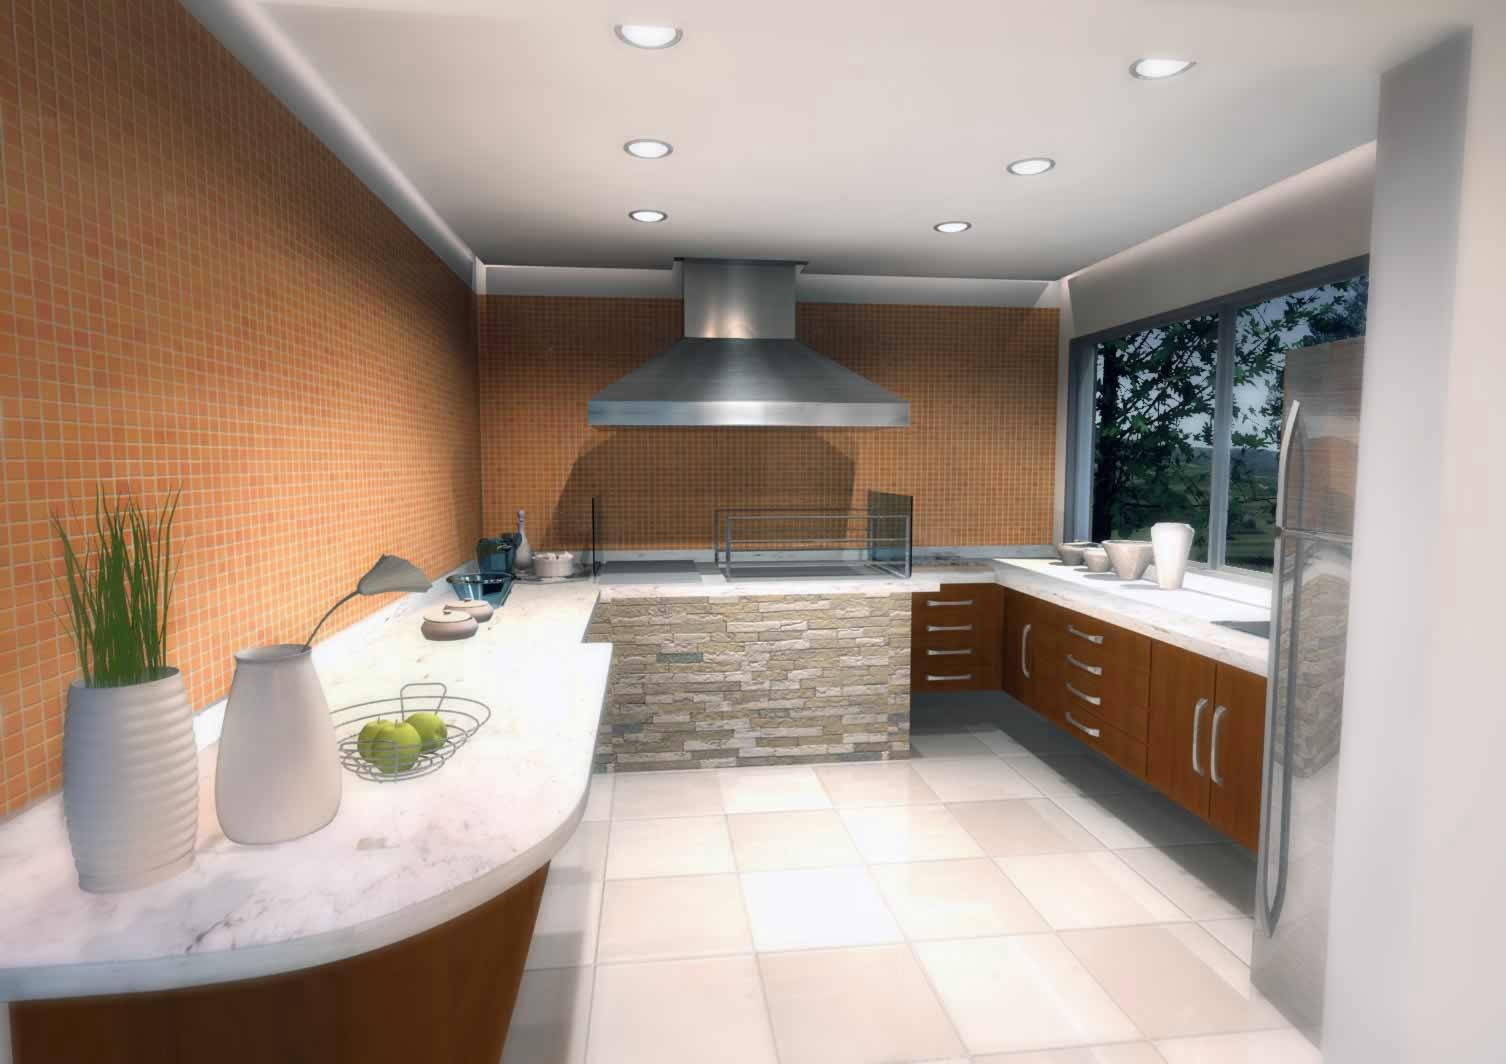 Ceiling Designs For Homes Interior Ceiling Design Ideas